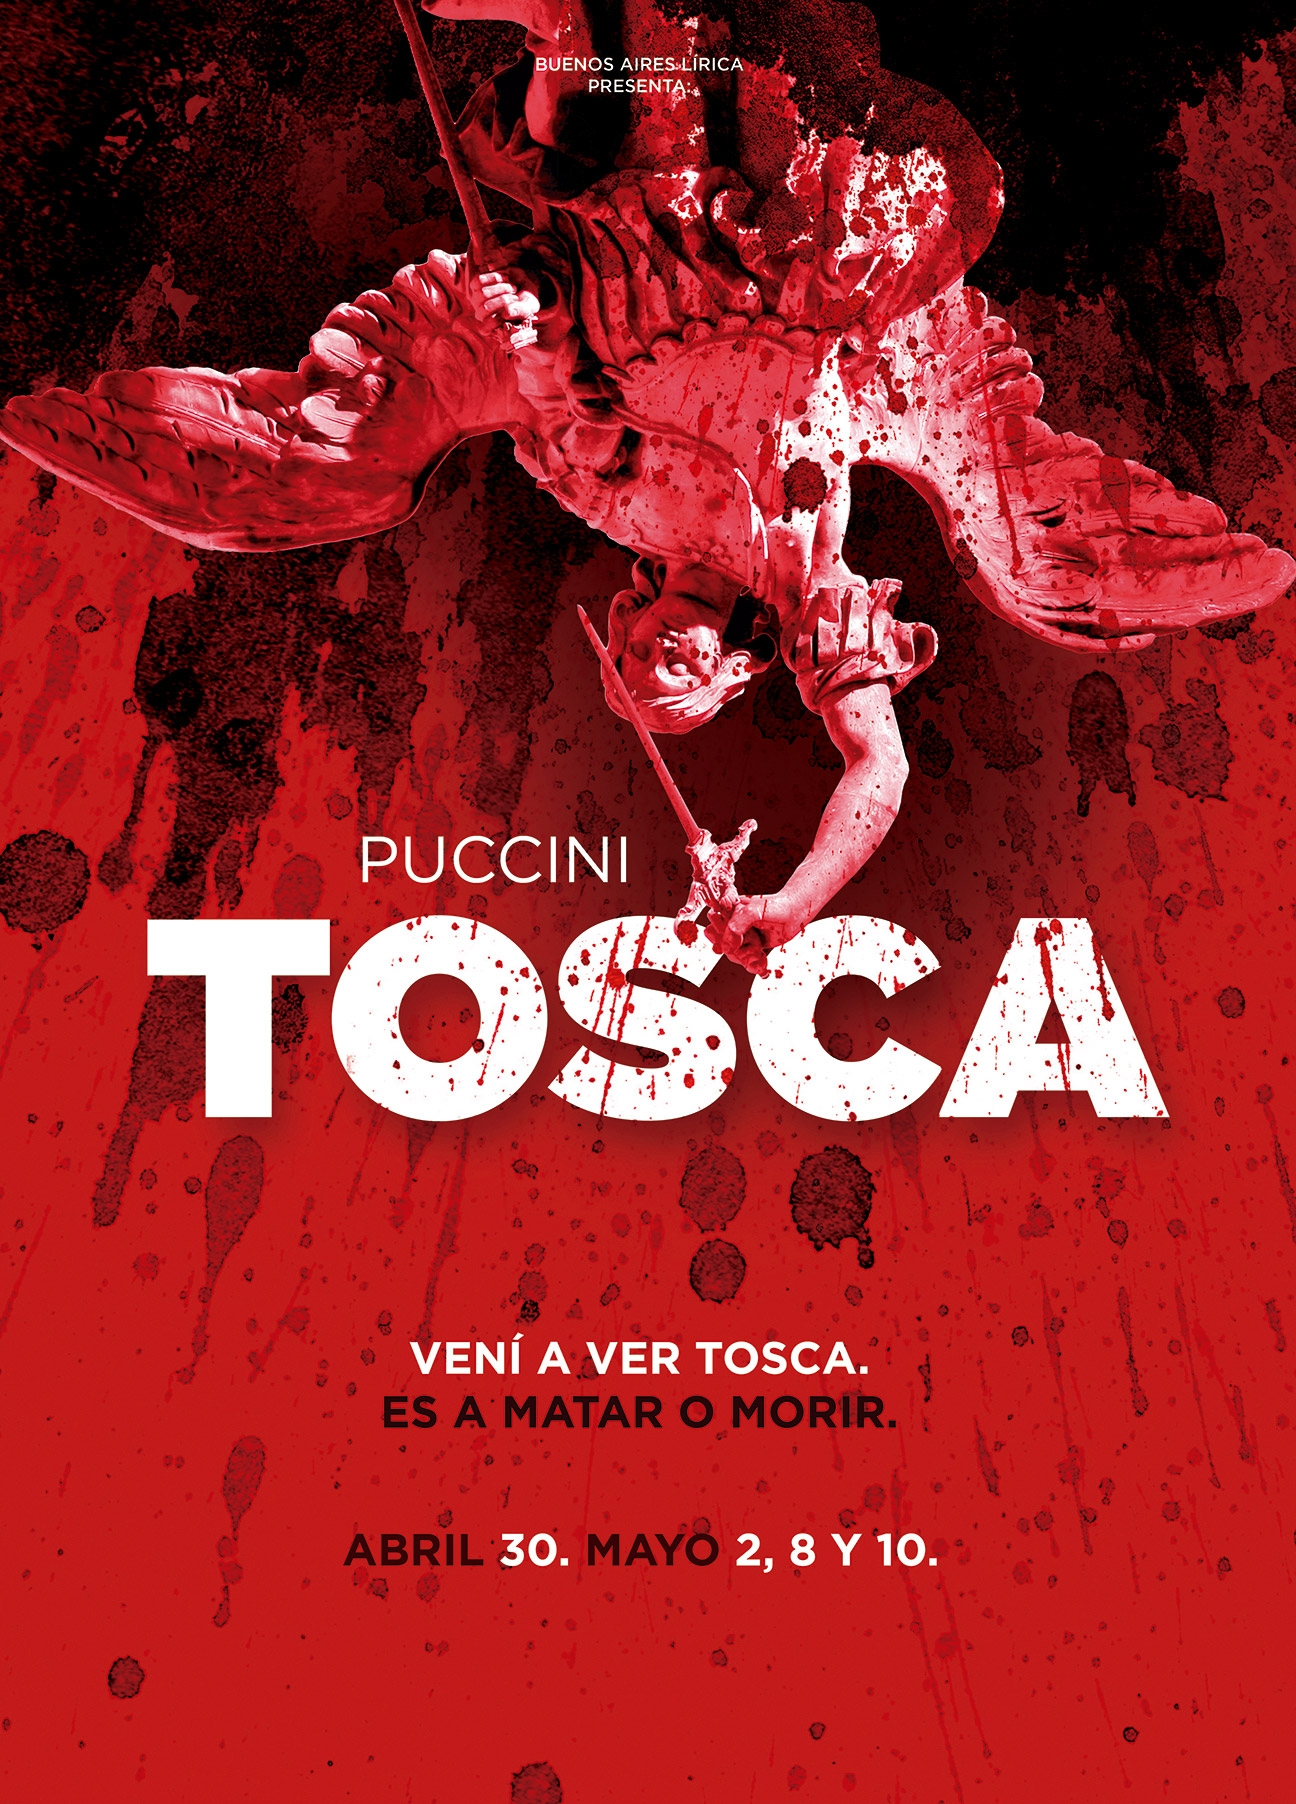 Diseño de afiche para ópera TOSCA - poster - BAL - productora de ópera. Diseño para redes sociales. Afiches.